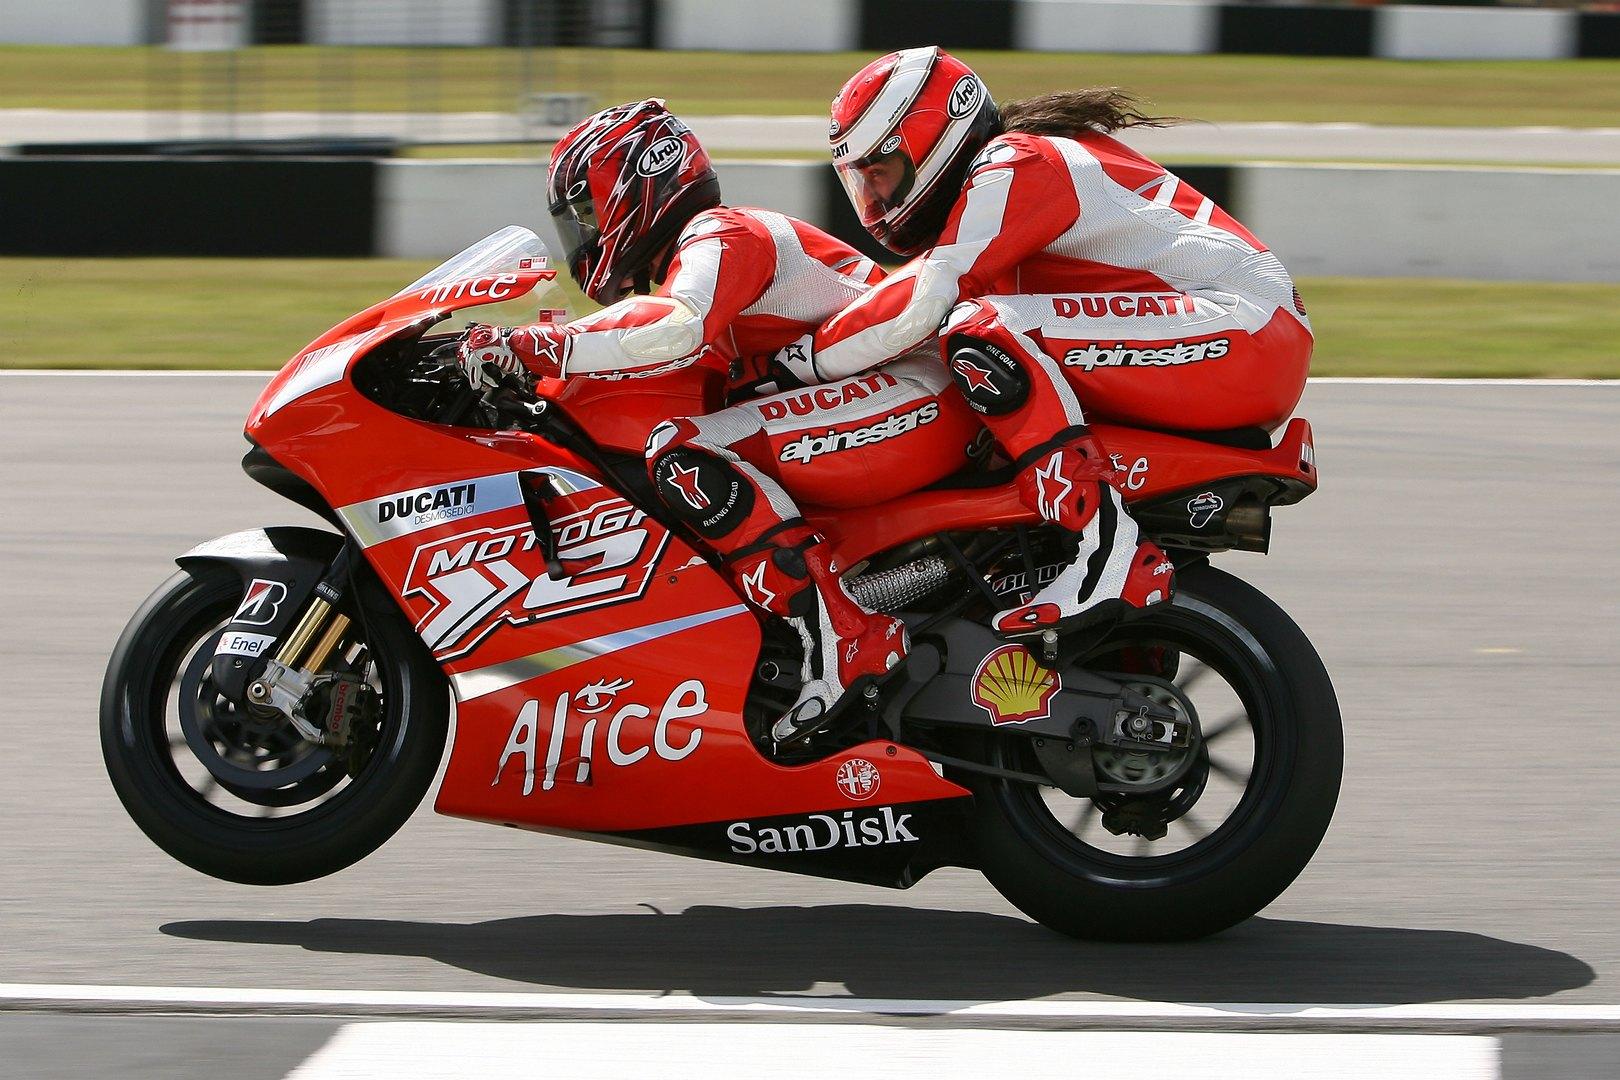 Ducati Panigale V Pillion Seat